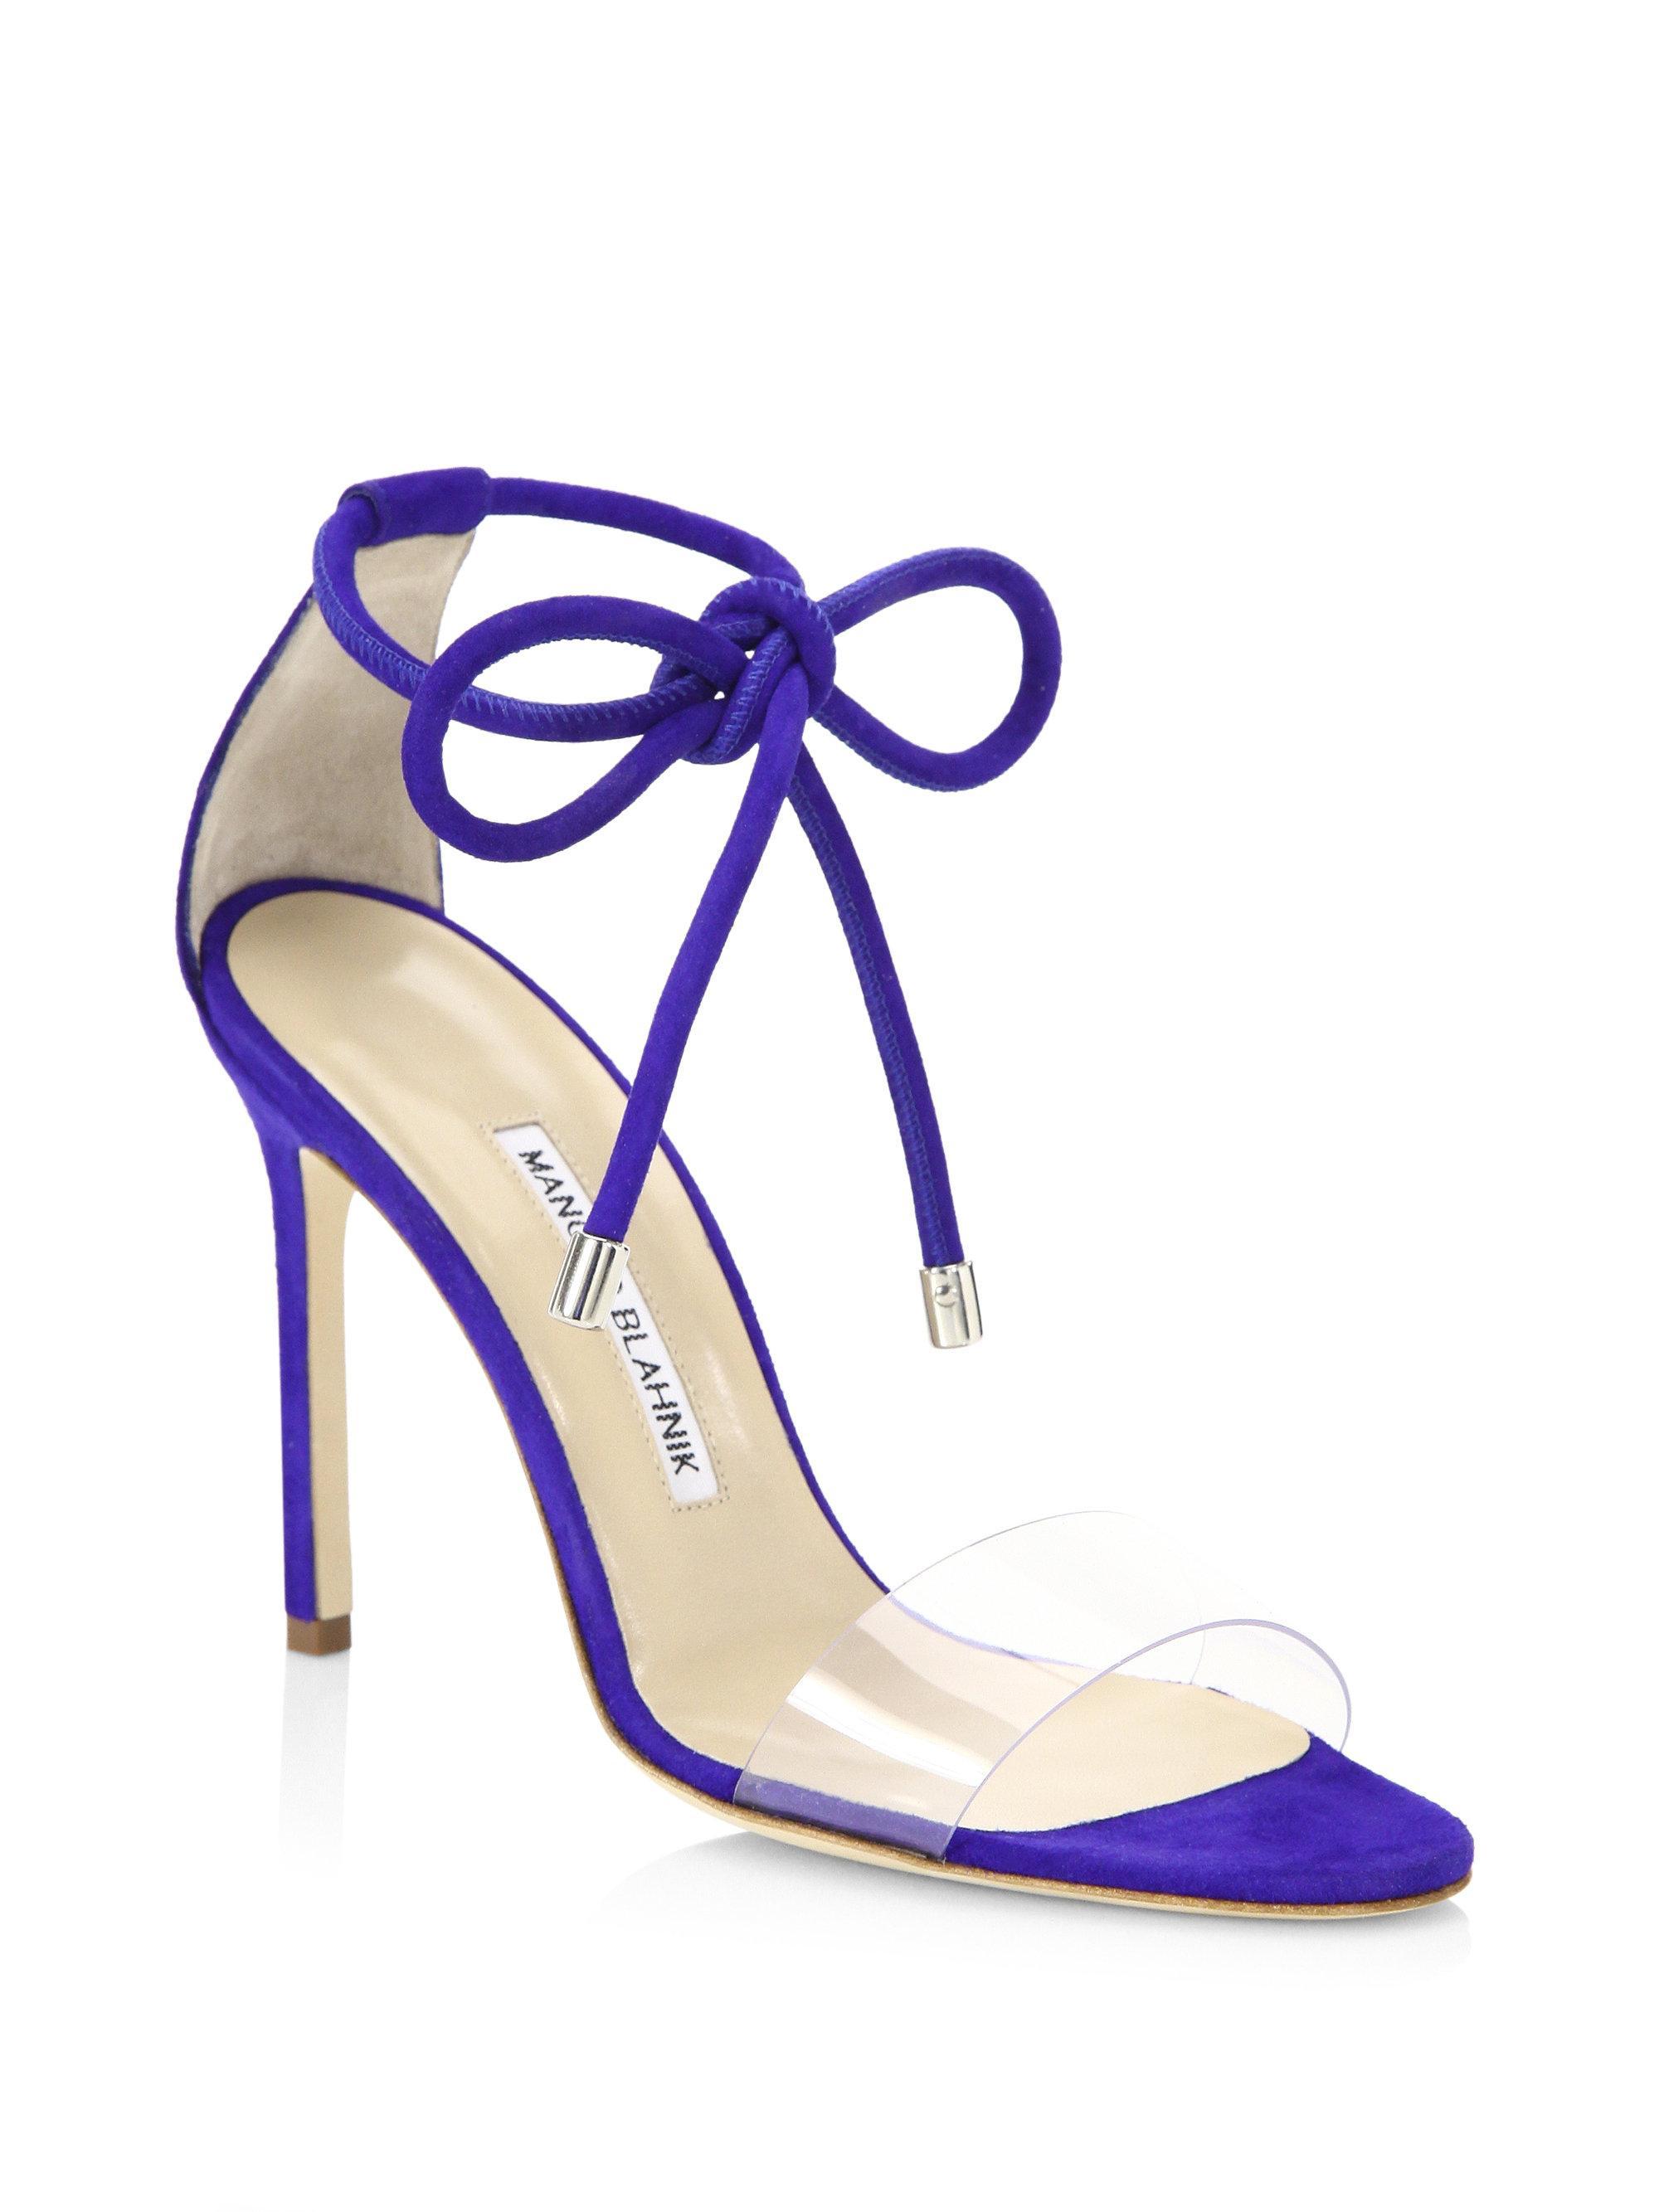 cf243d2a14eb2 Manolo Blahnik Estro Ankle Tie Stilettos in Blue - Lyst